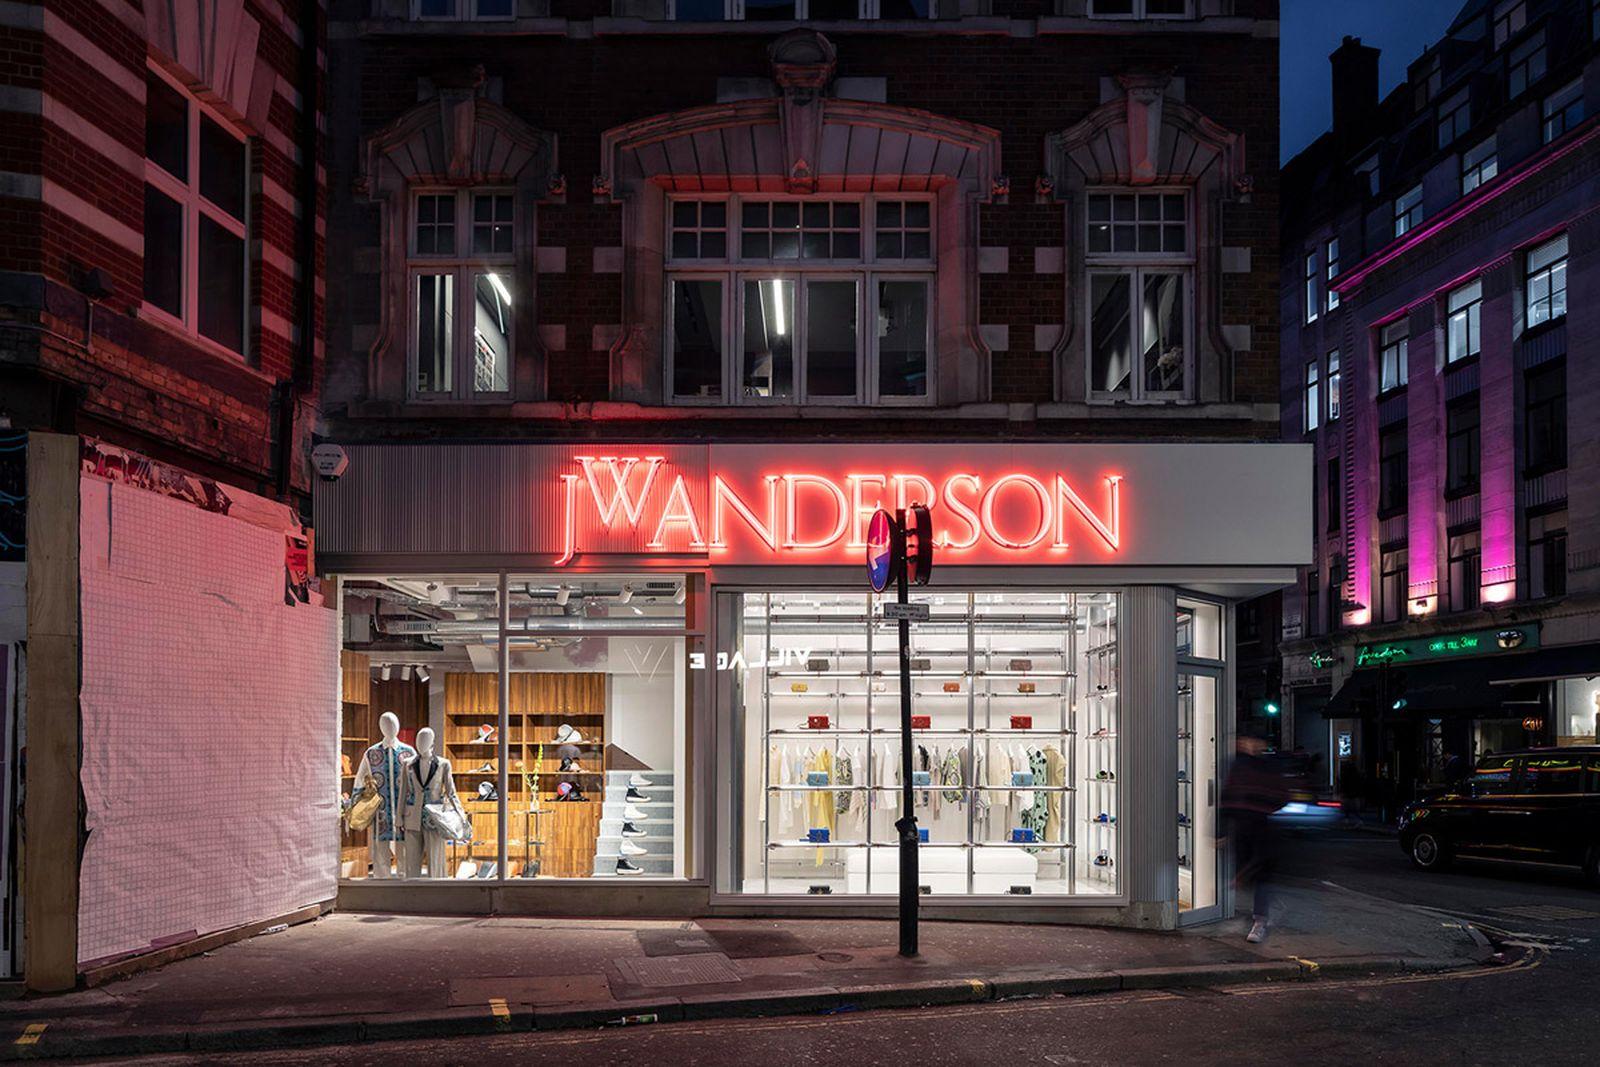 jw-jonathan-anderson-soho-london-uk-flagship-store-opening-3